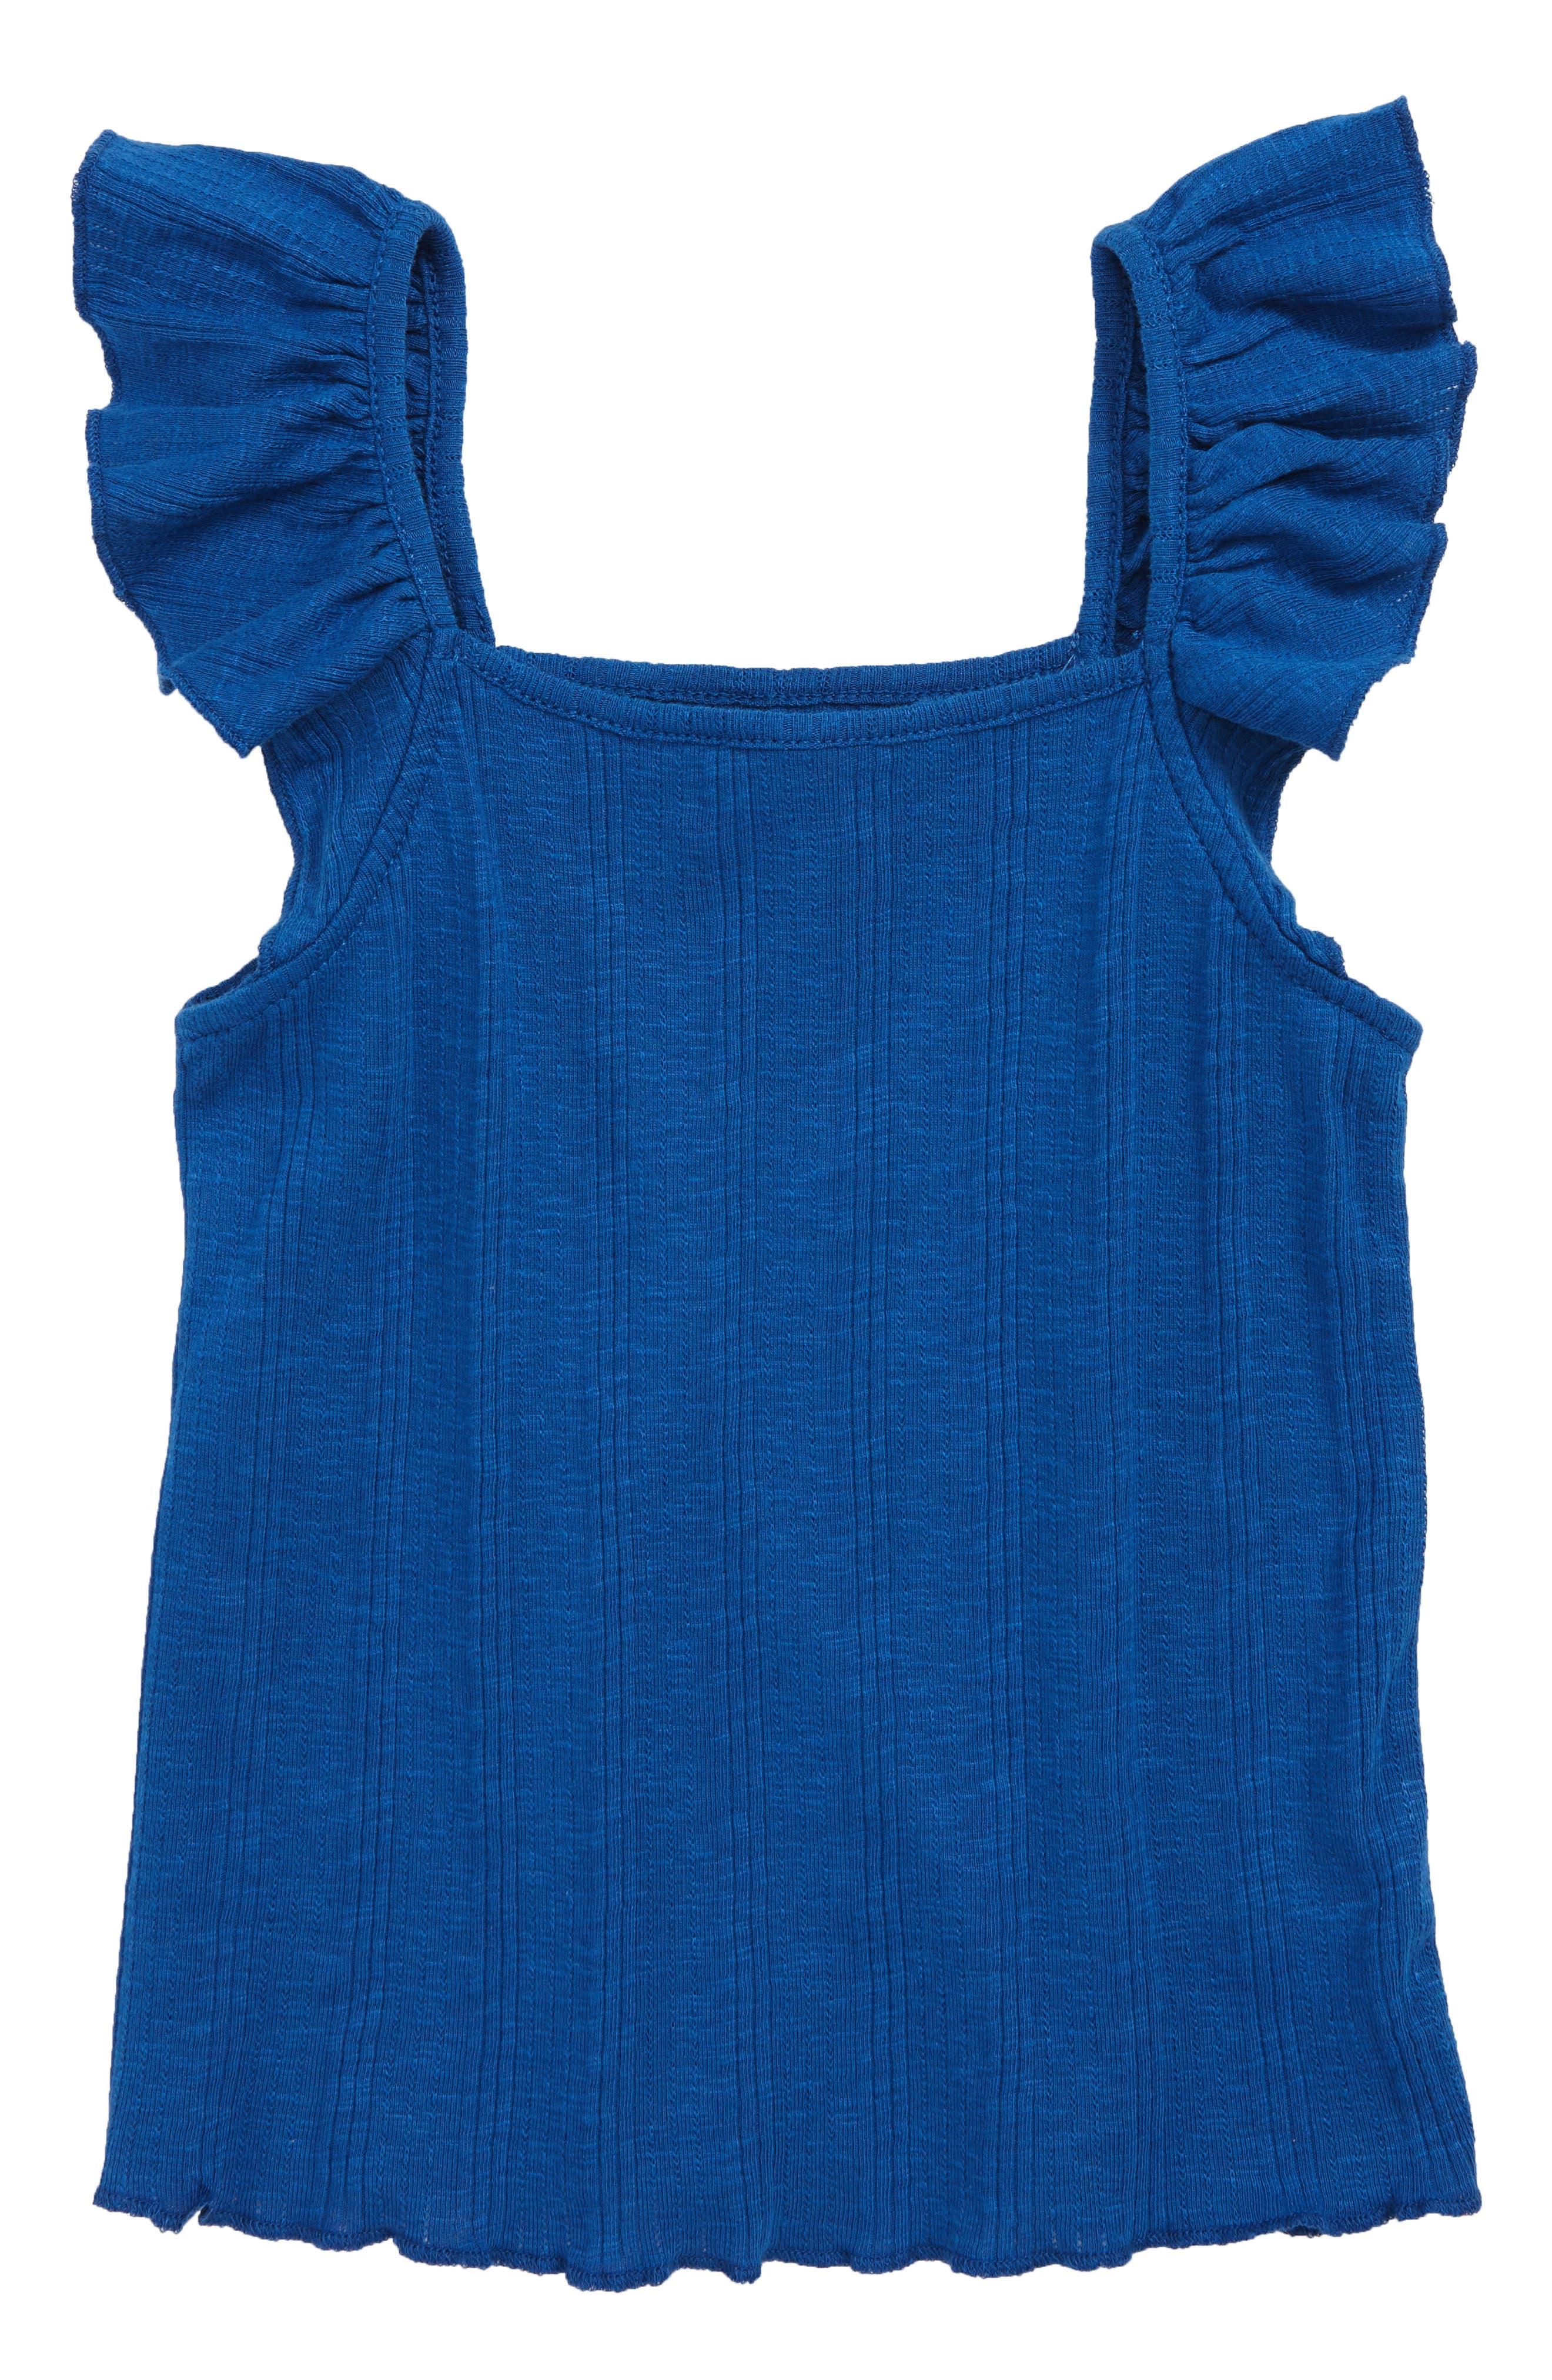 Too Cute Flutter Tank Top, Main, color, BLUE MONACO